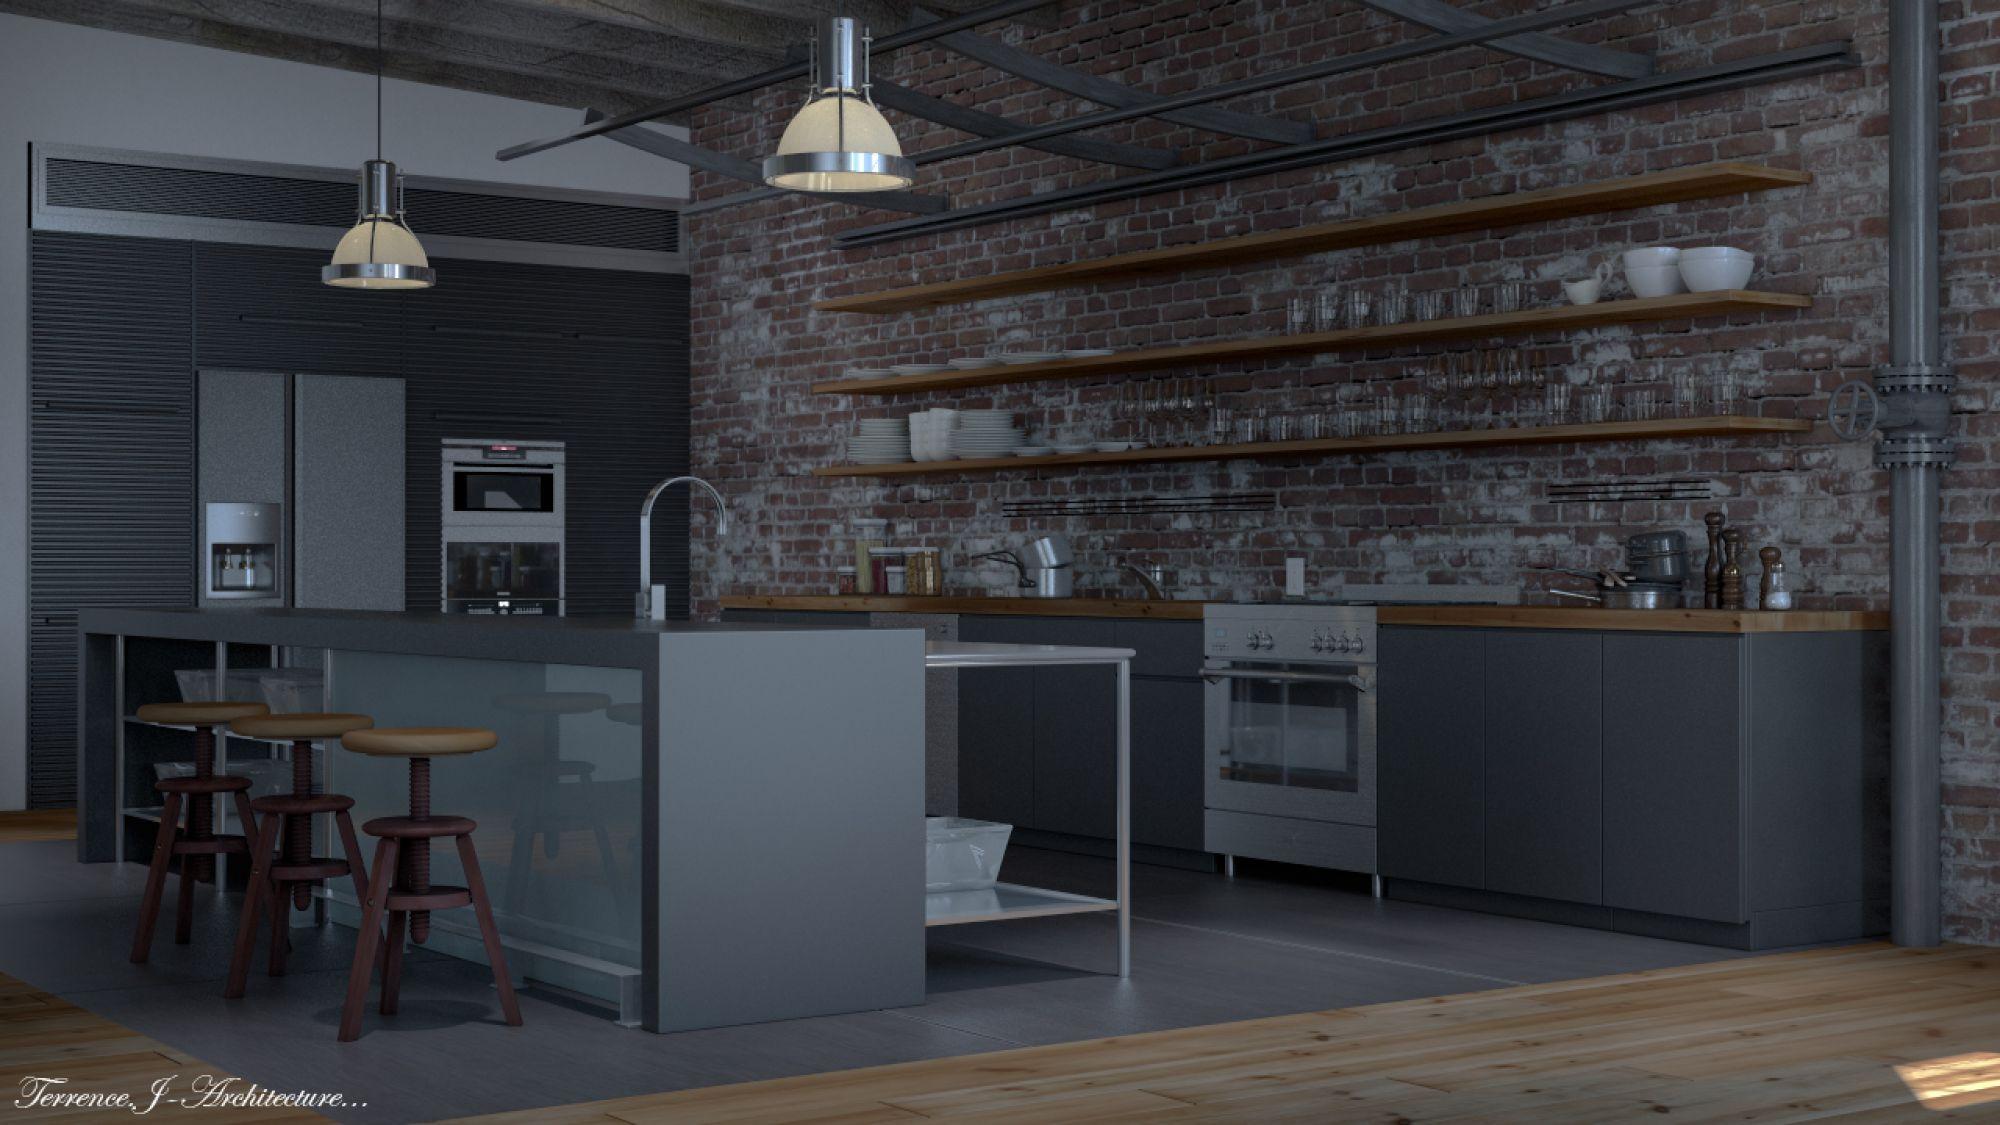 Loft Kitchens Google Search Kitchens Pinterest Loft Kitchen Lofts And Kitchens